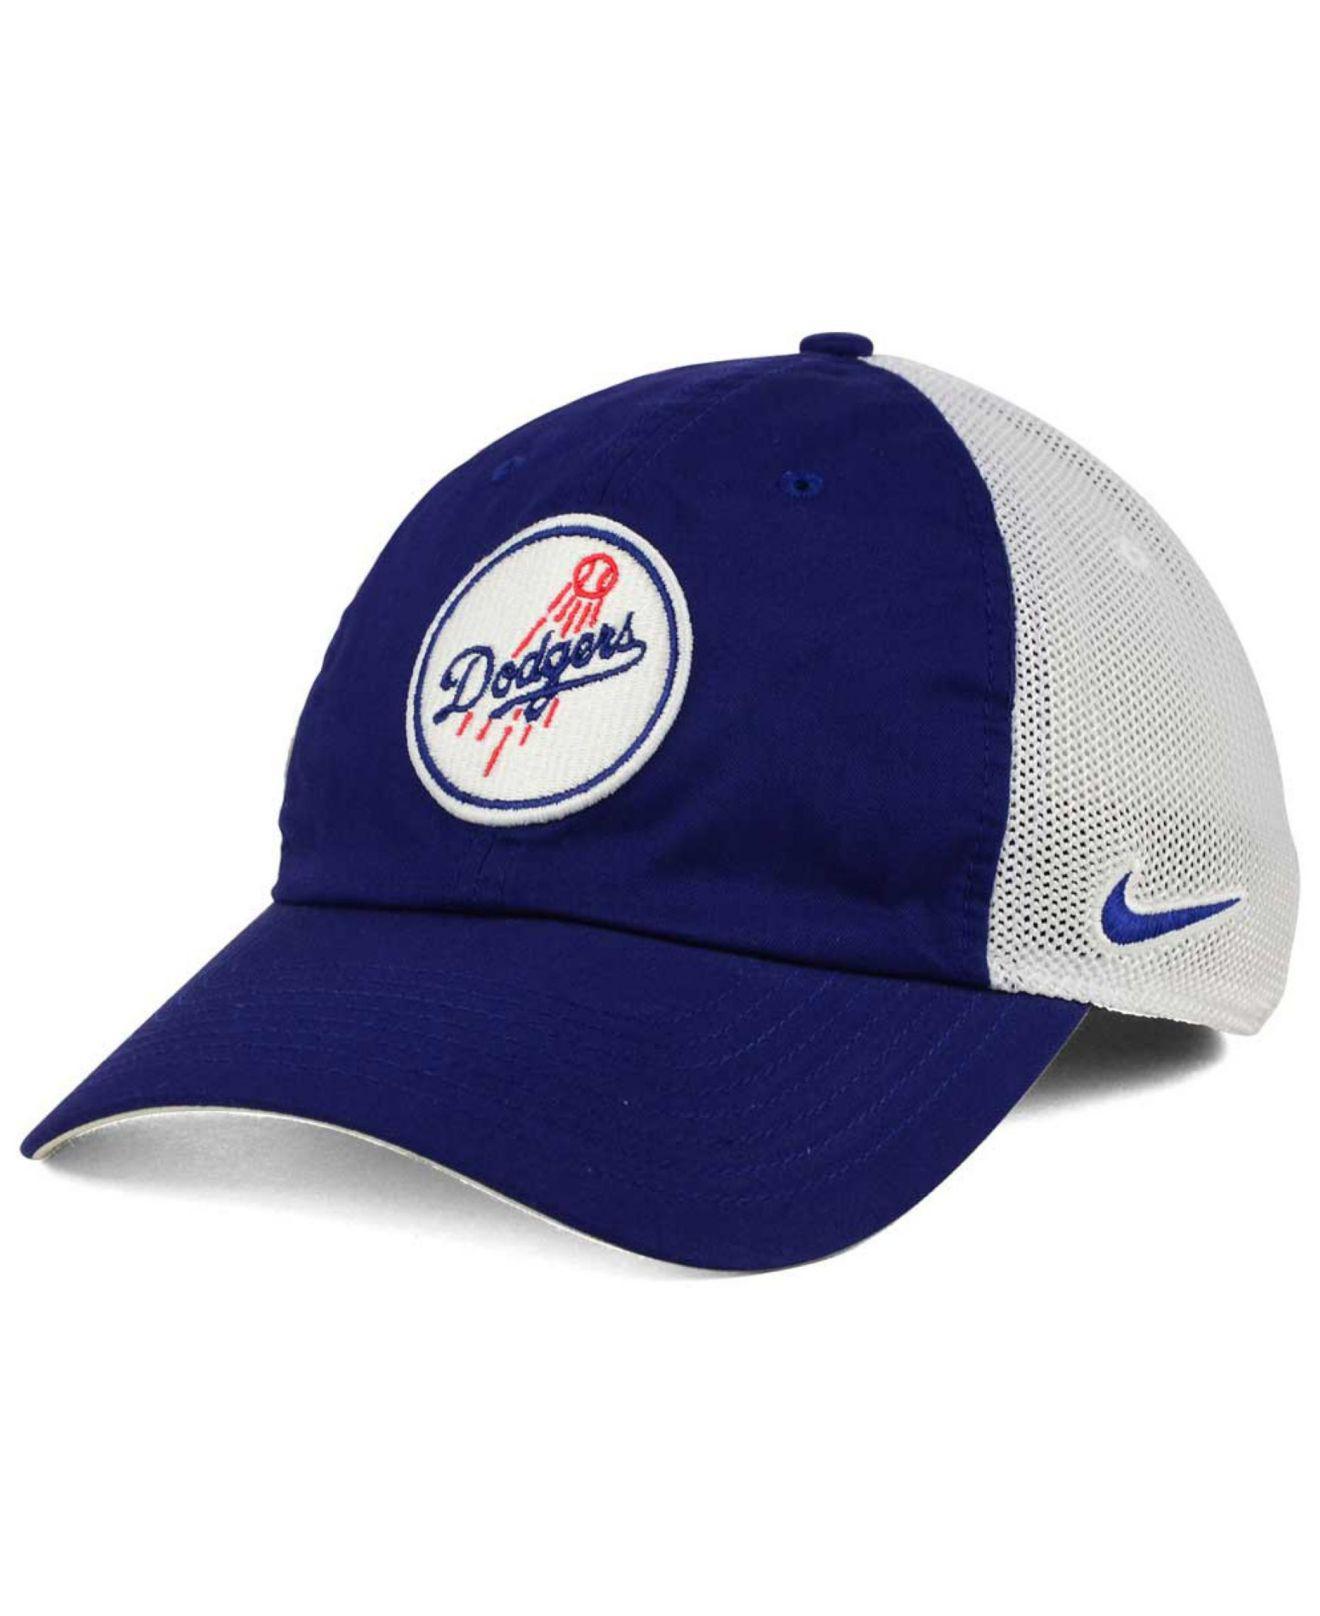 new style f8594 6c07f Nike. Men s Blue Los Angeles Dodgers Dri-fit Mesh Swoosh Adjustable Cap